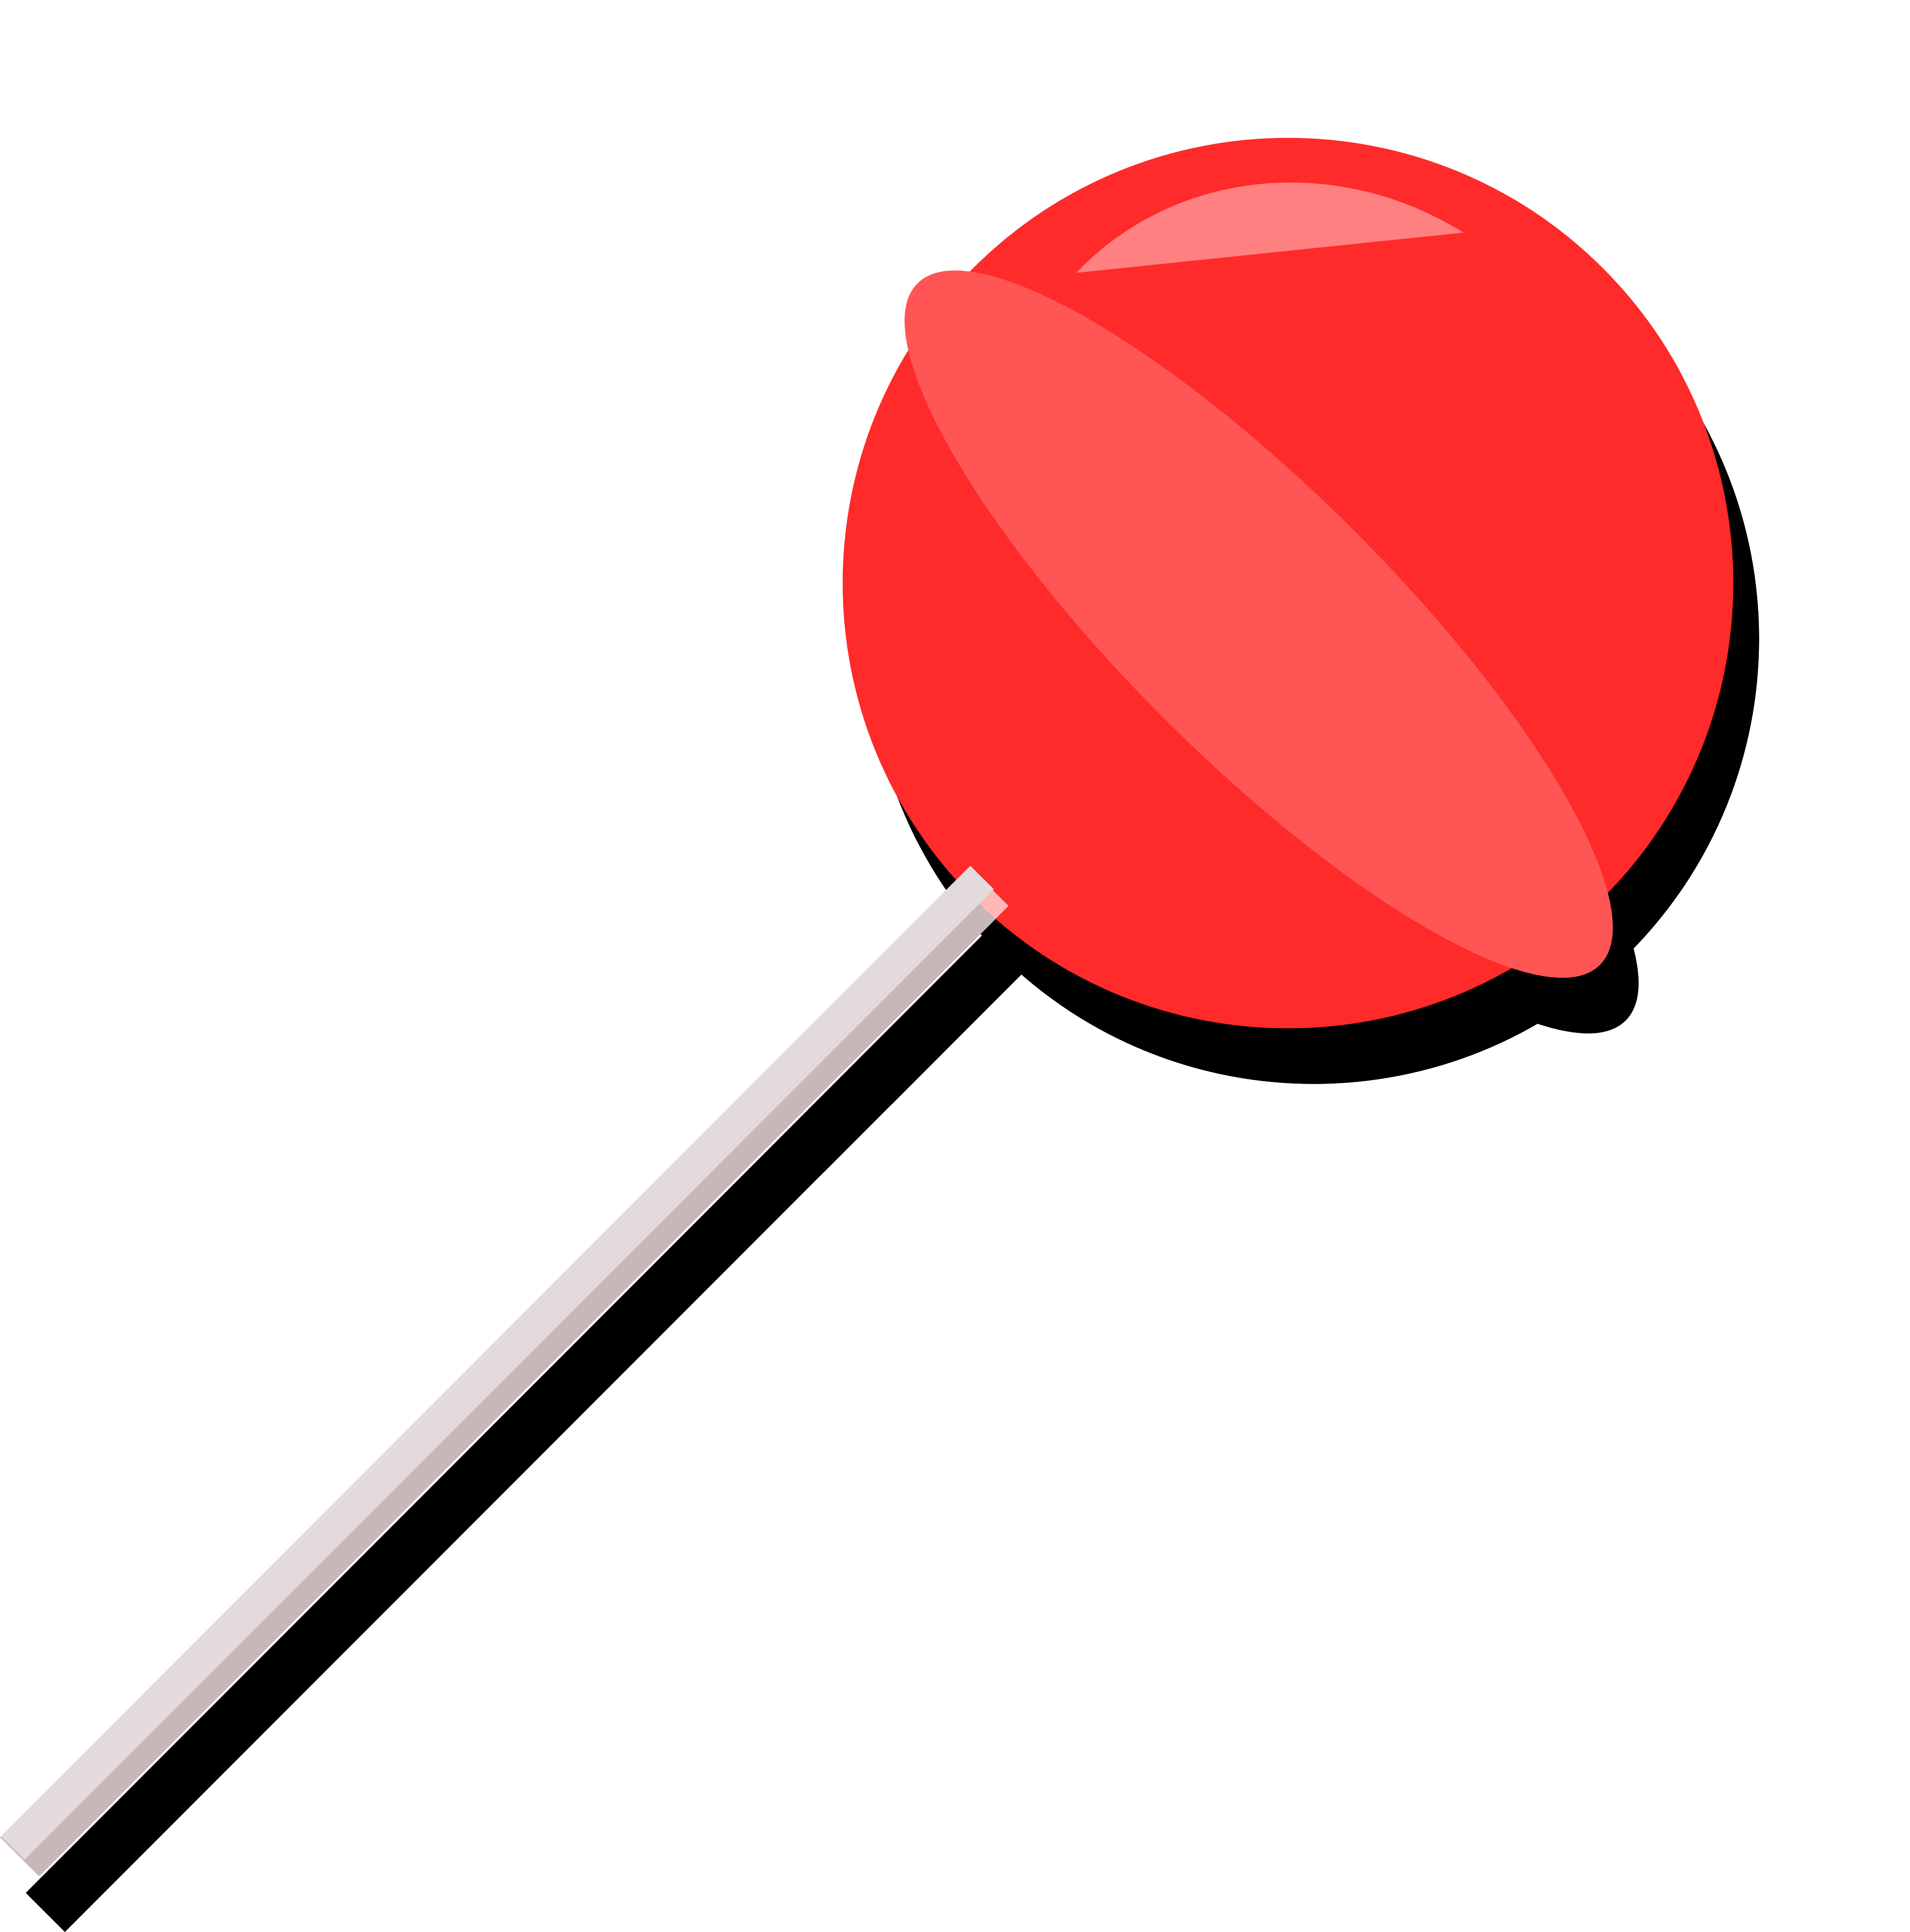 Lollipop clipart drawing. Pin emoji clip art